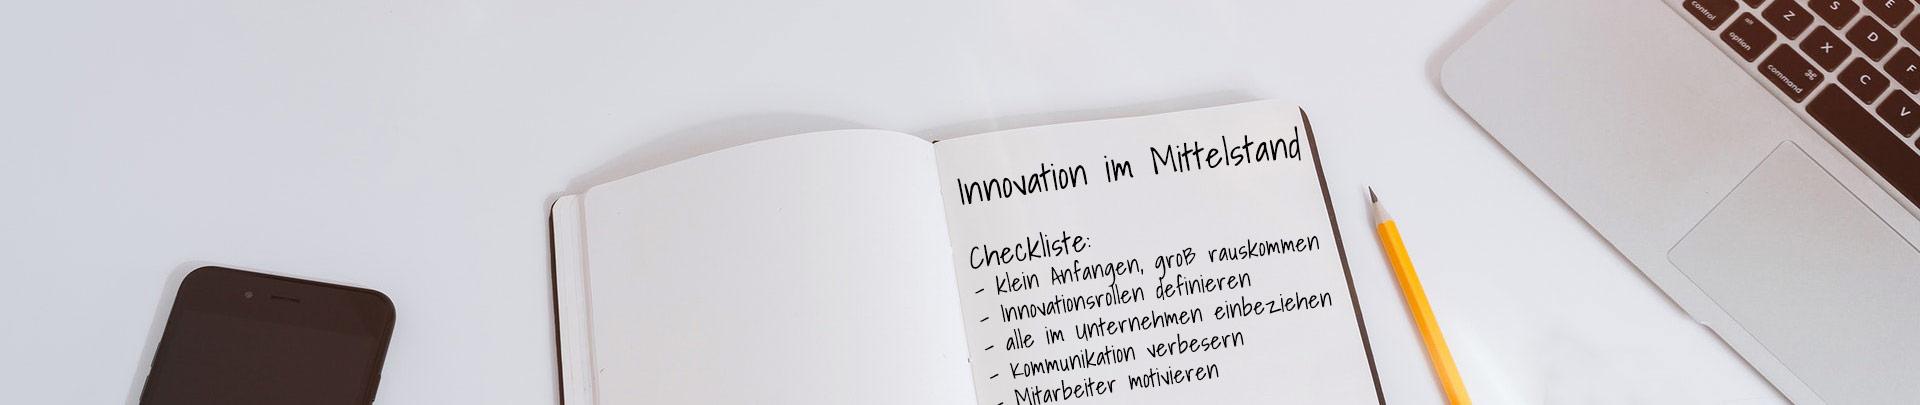 Innovation im Mittelstand